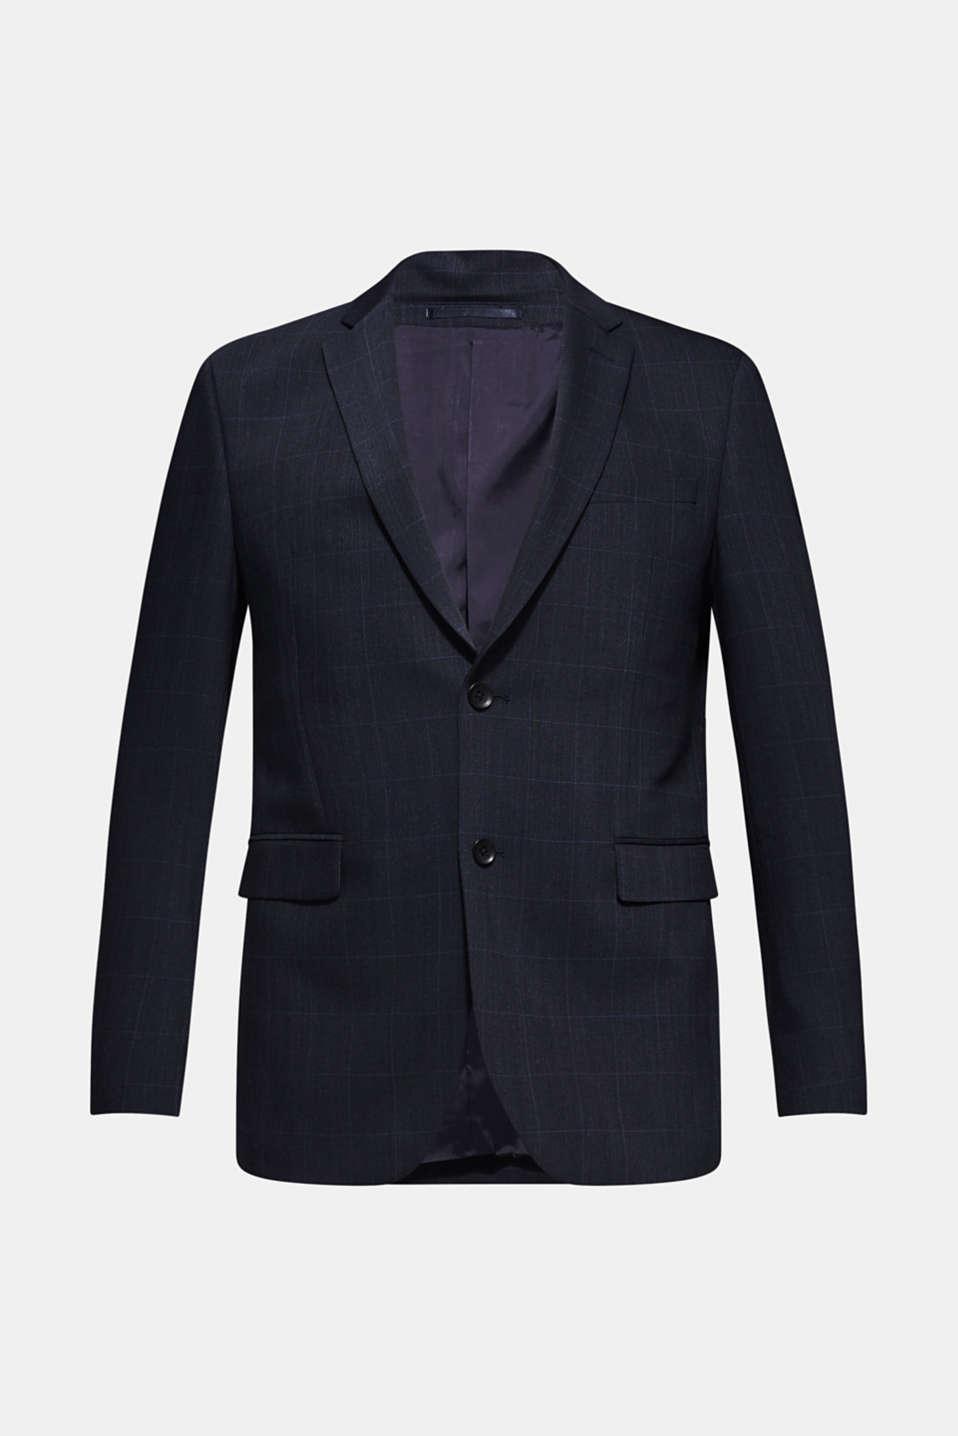 Blazers suit, DARK BLUE, detail image number 7